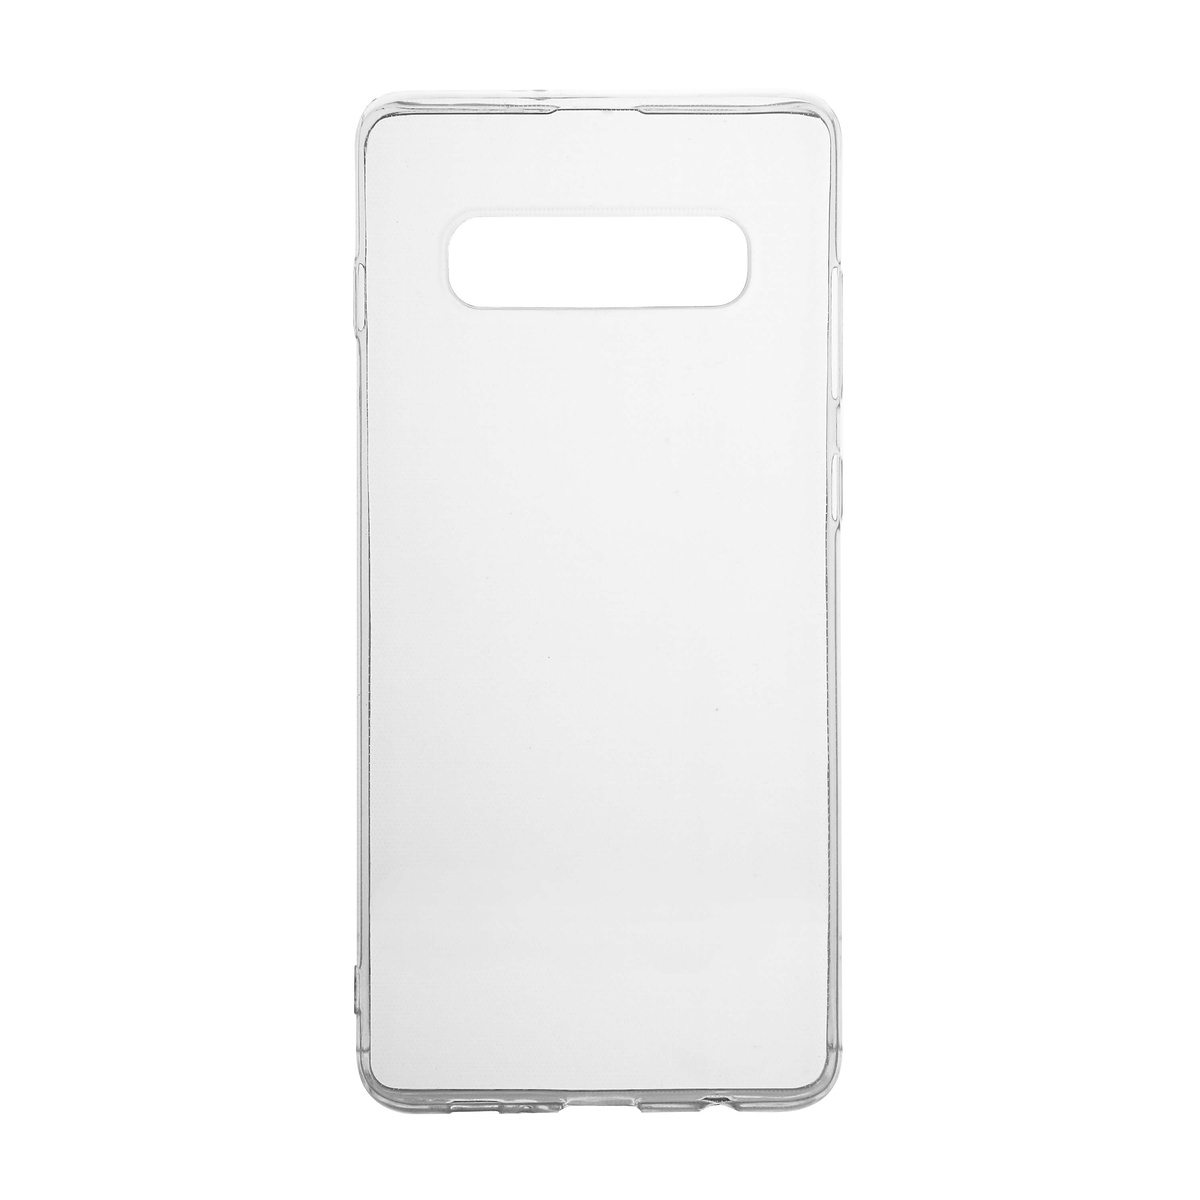 Gear Flexibelt TPU-skal, Samsung Galaxy S10 Plus, transparent